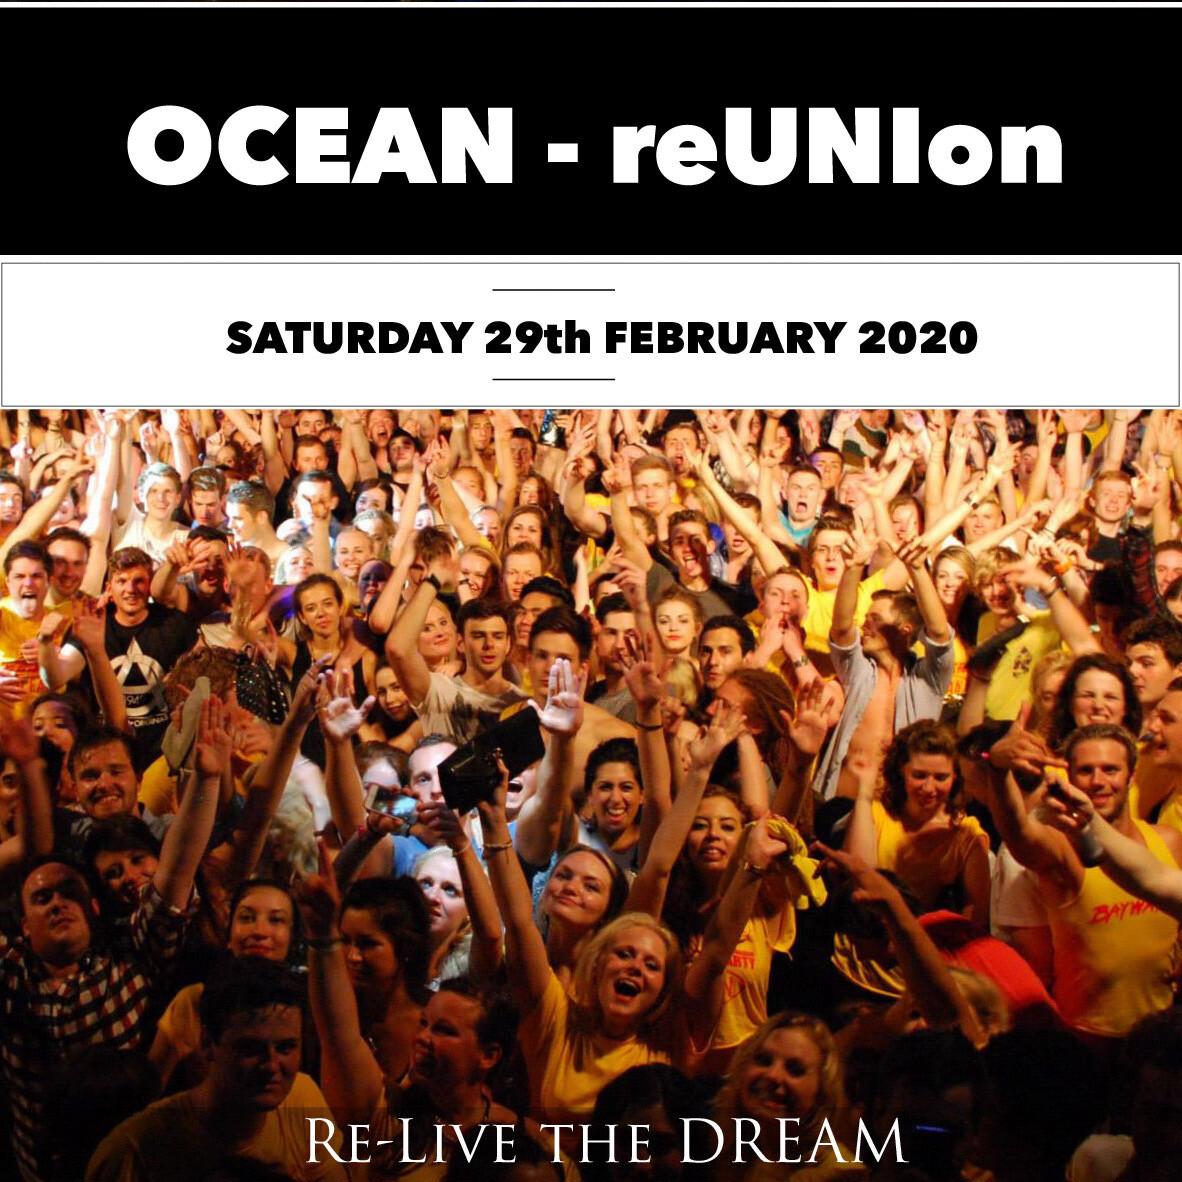 Ocean reUNion - Saturday 29th February 2020